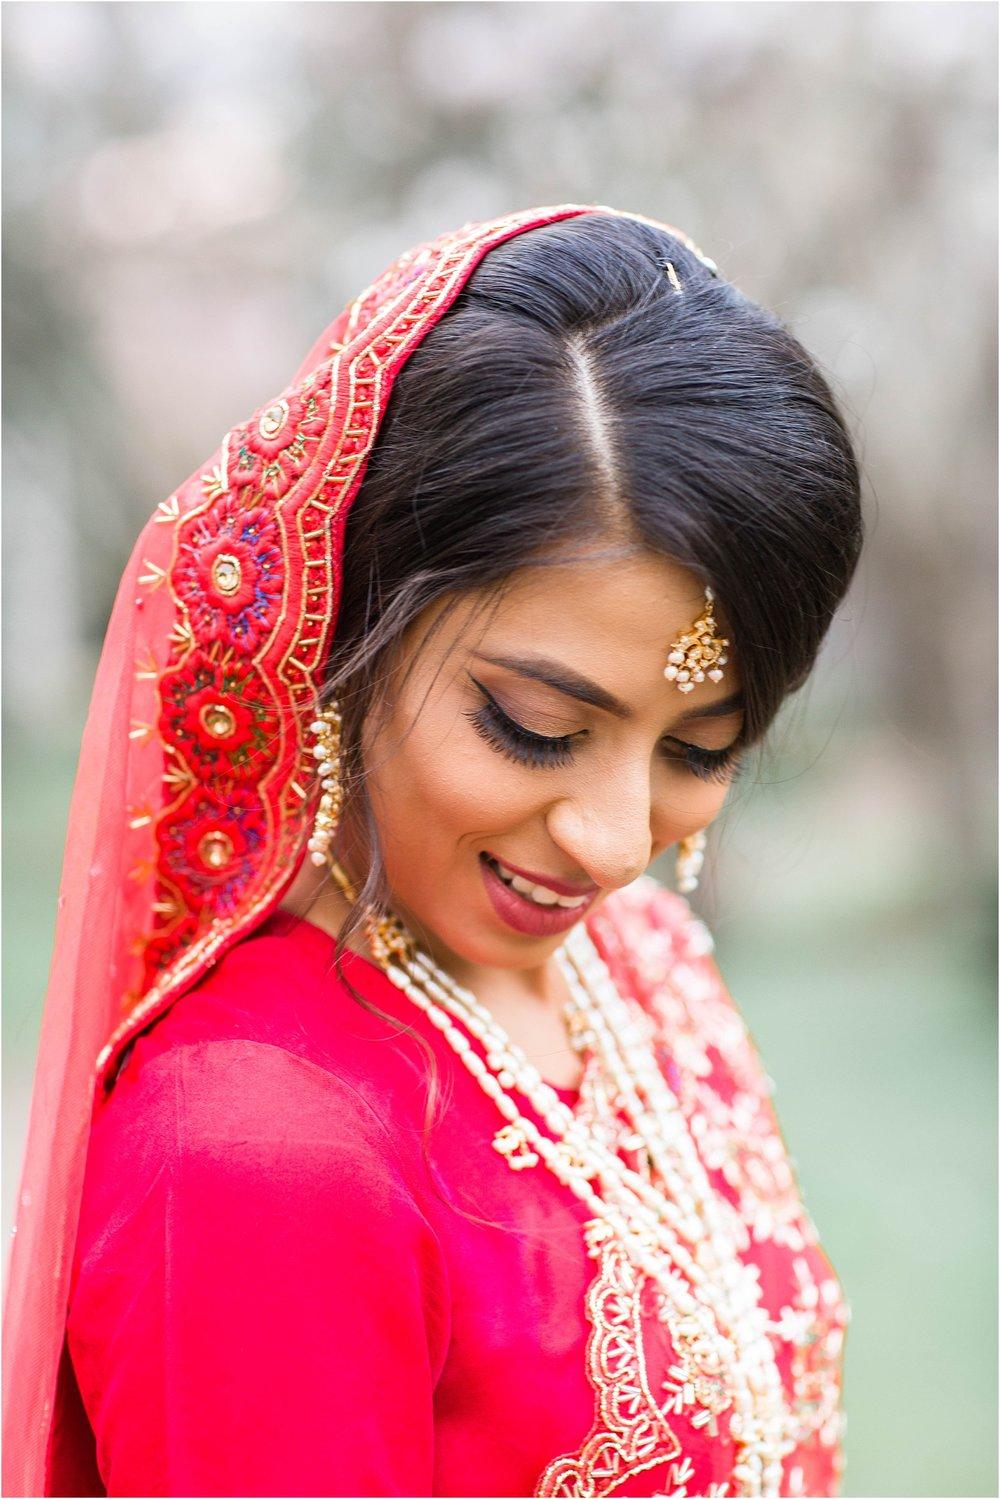 Jame-Masjid-Coopers-Mosque-Kariya-Park-Cherry-Blossoms-Wedding-Toronto-Mississauga-Brampton-Scarborough-GTA-Pakistani-Indian-Wedding-Engagement-Photographer-Photography_0066.jpg